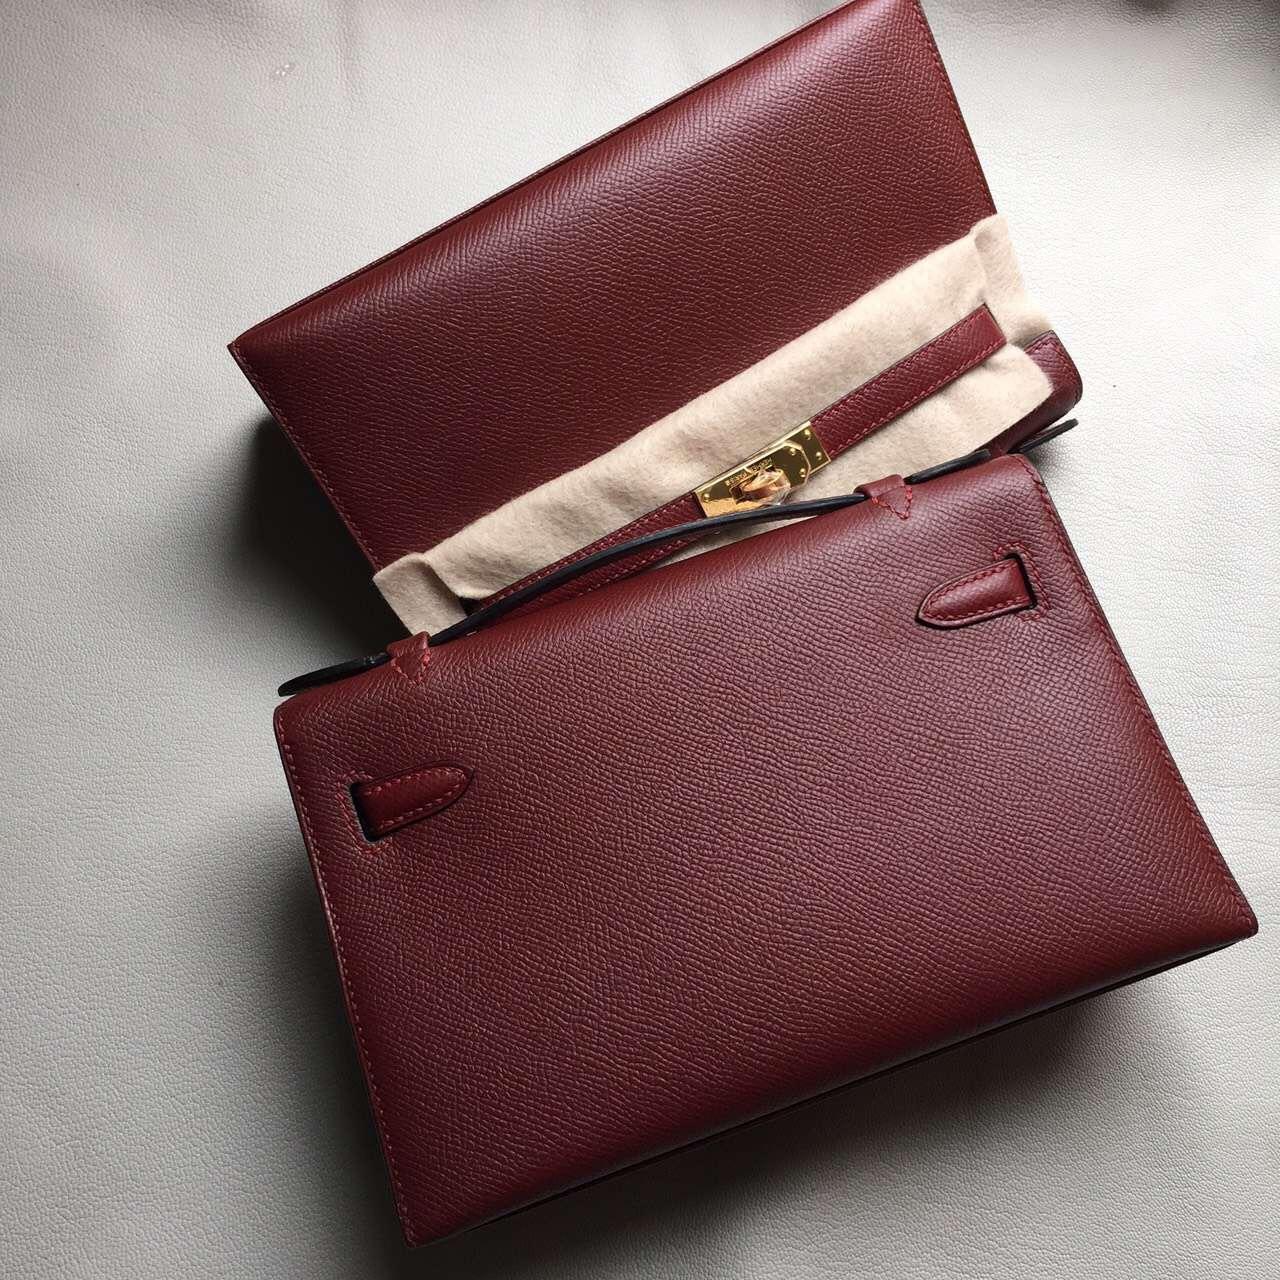 Hand Stitching Hermes Rouge Hermes Epsom Leather Minikelly Pochette 22CM